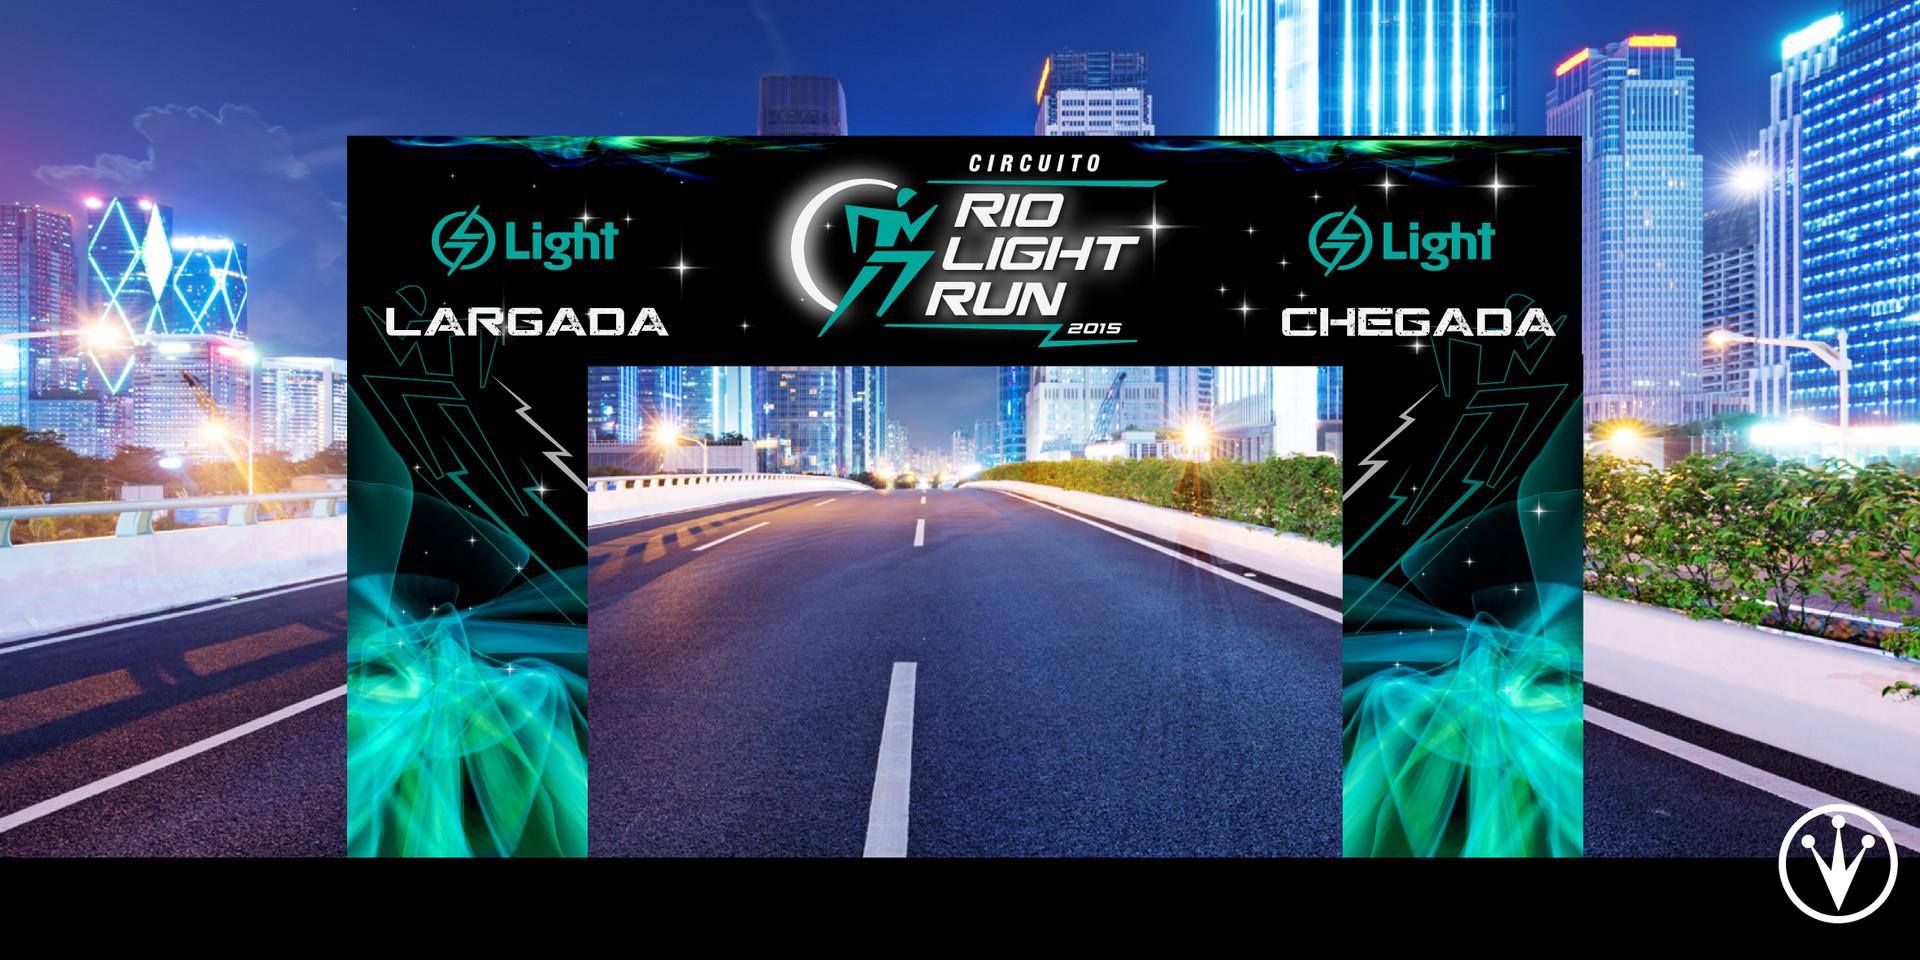 RIO_LIGHT_RUN_2017-2.jpg